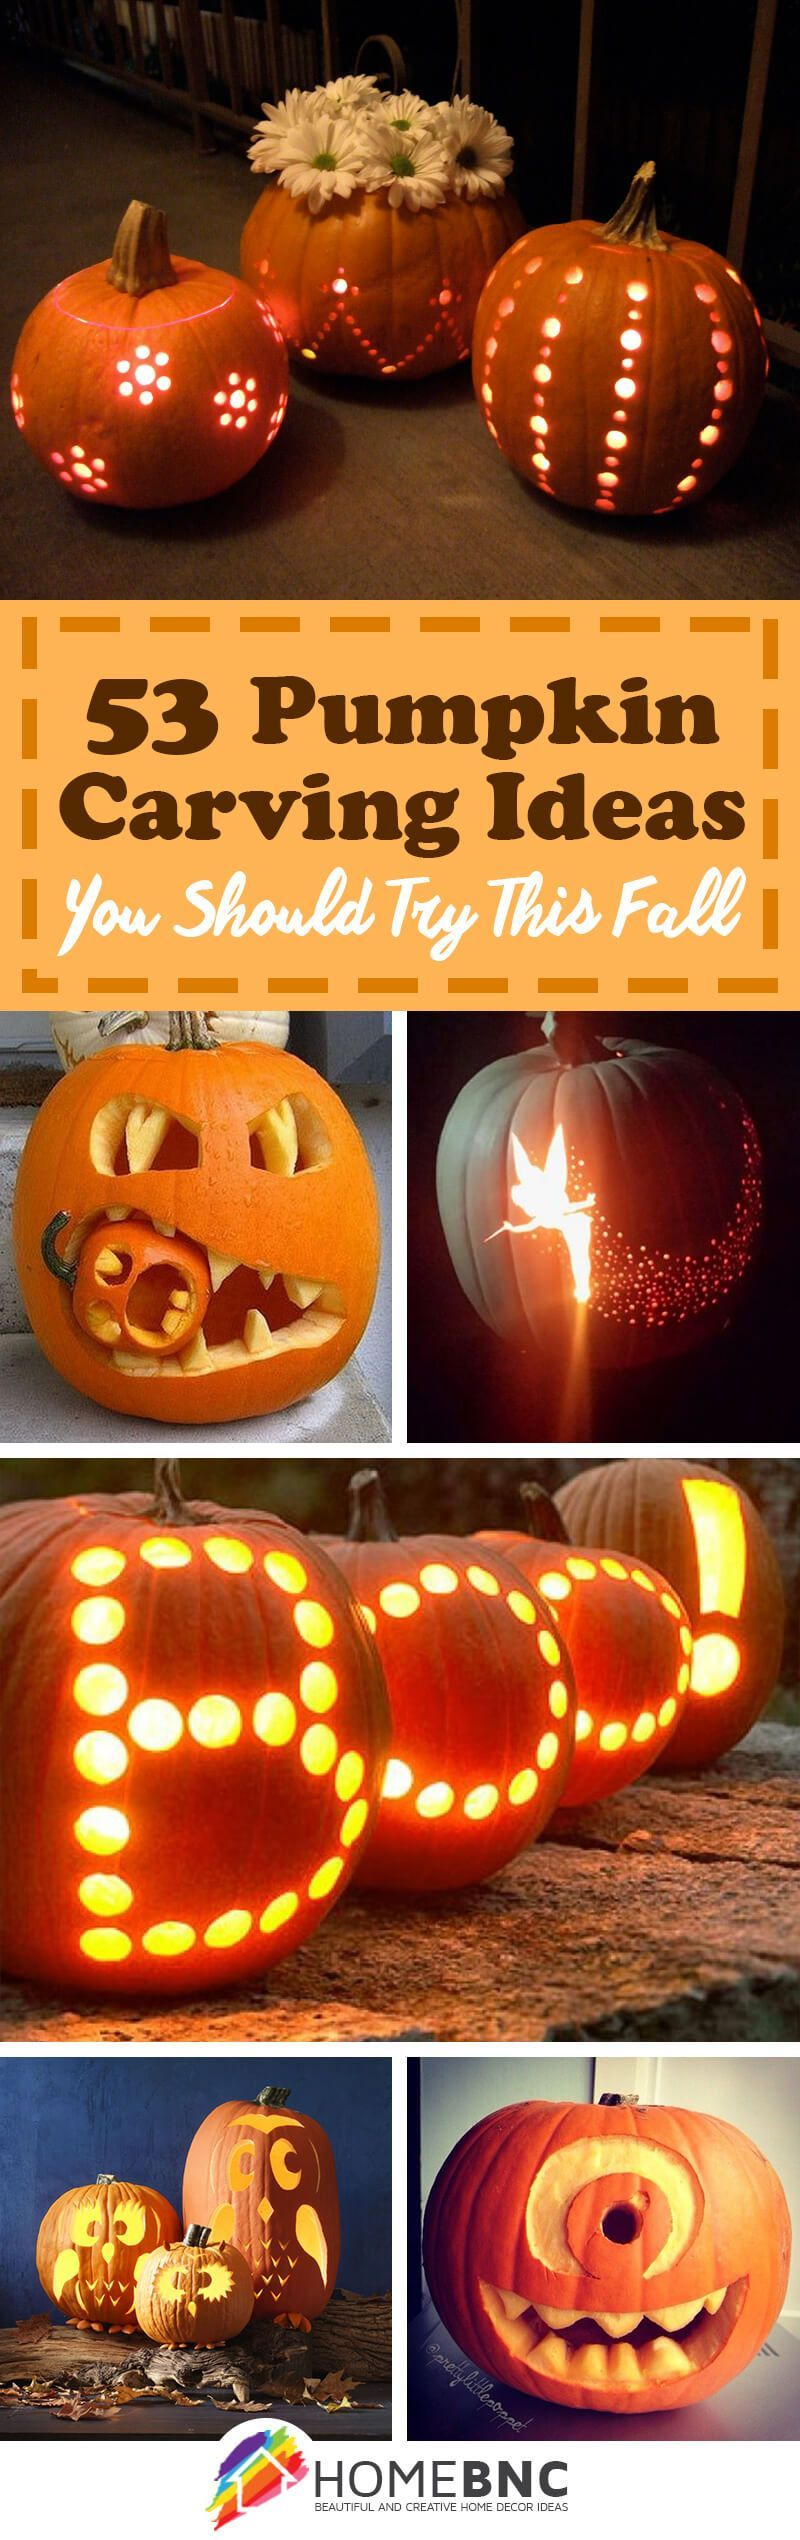 Carving Decor IdeasPumpkin Carving Decor Ideas